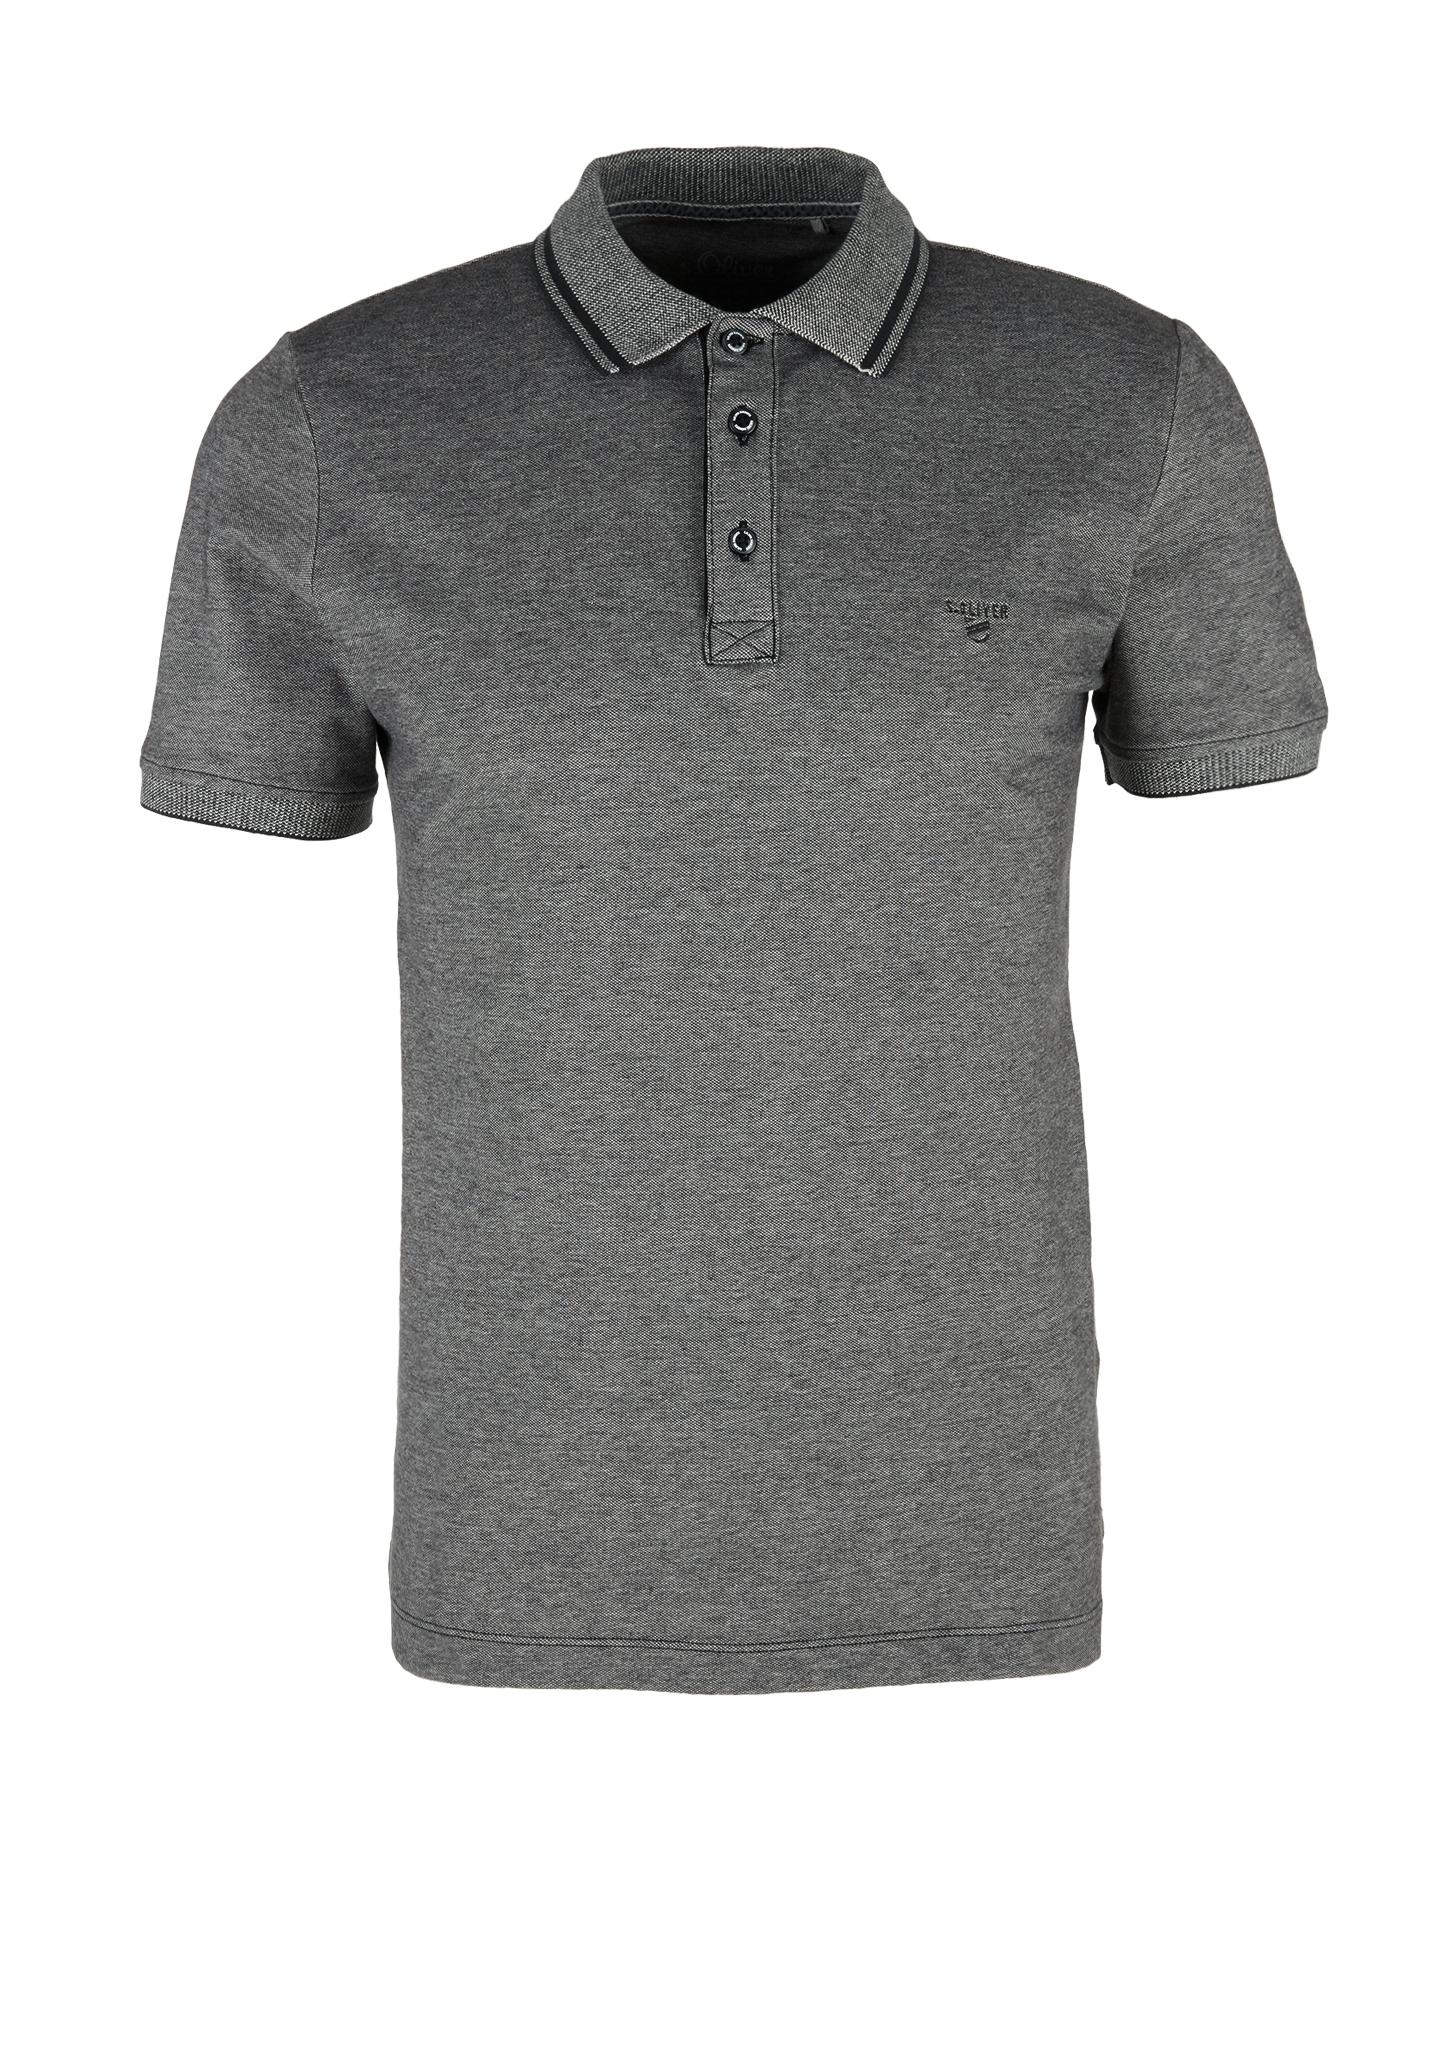 Melange-Poloshirt | Bekleidung > Polo Shirts > Langarm | Grau | 97% baumwolle -  3% elasthan | s.Oliver